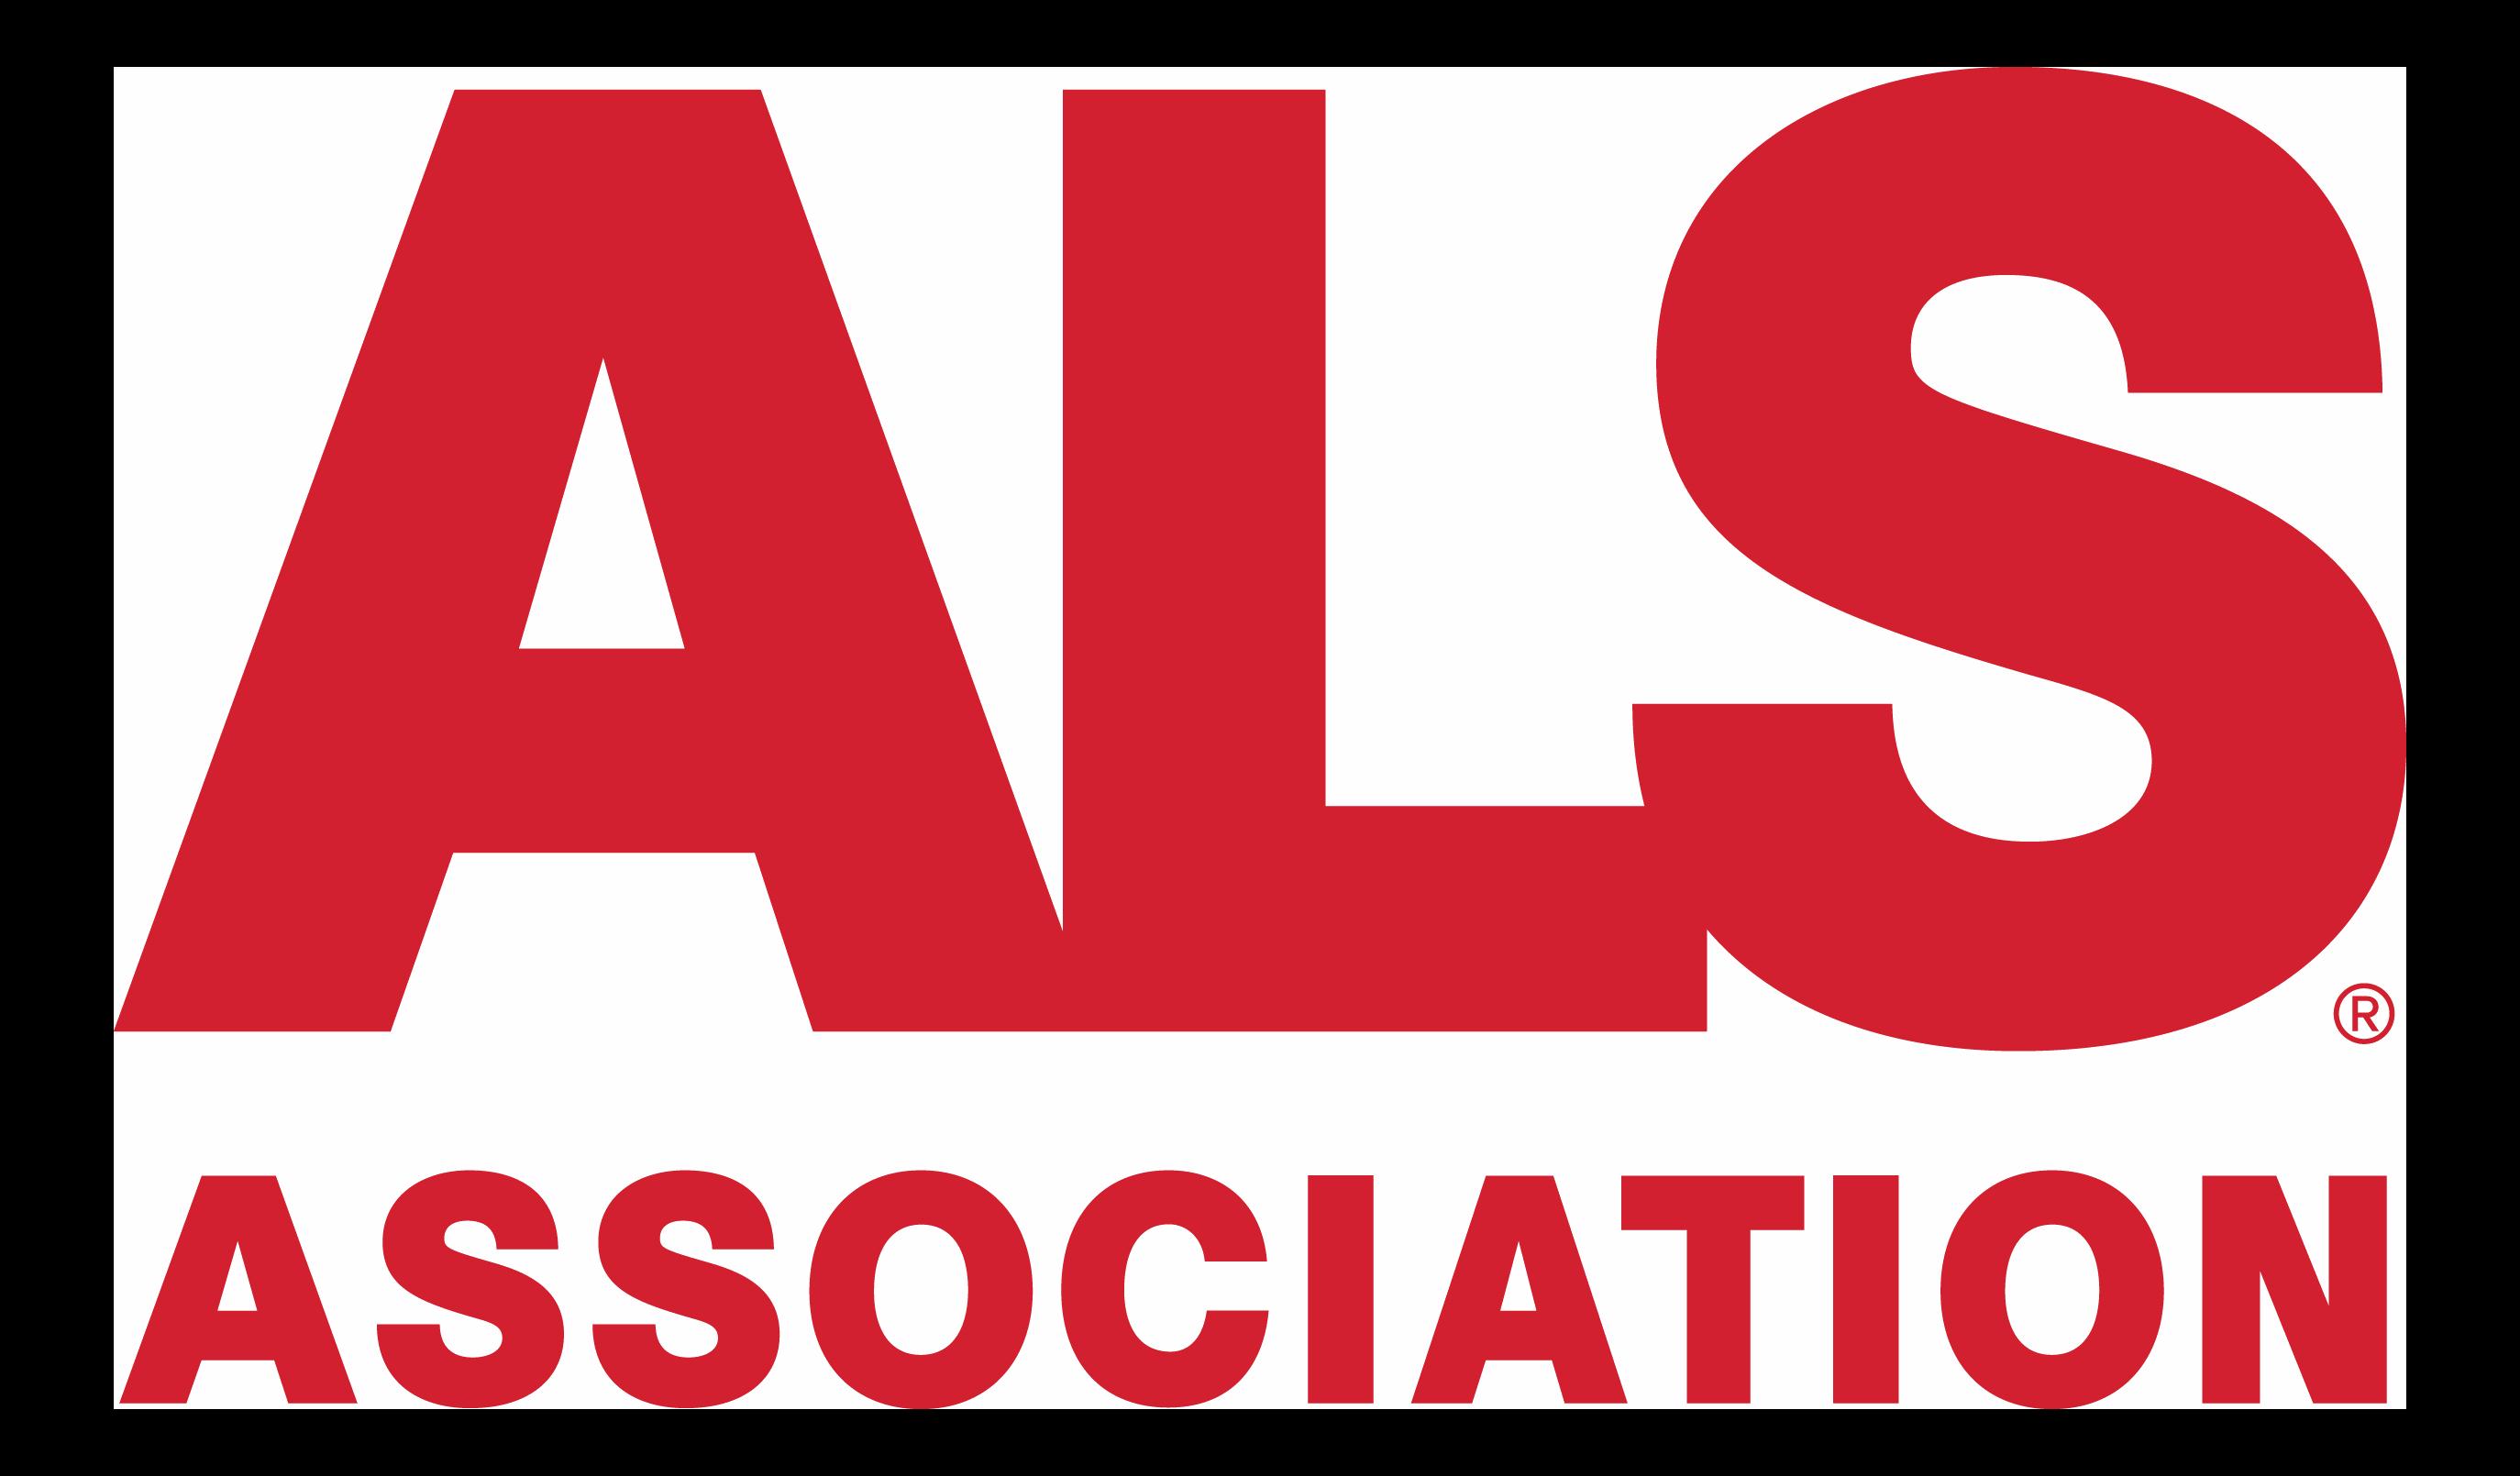 ALS Association logo transparent